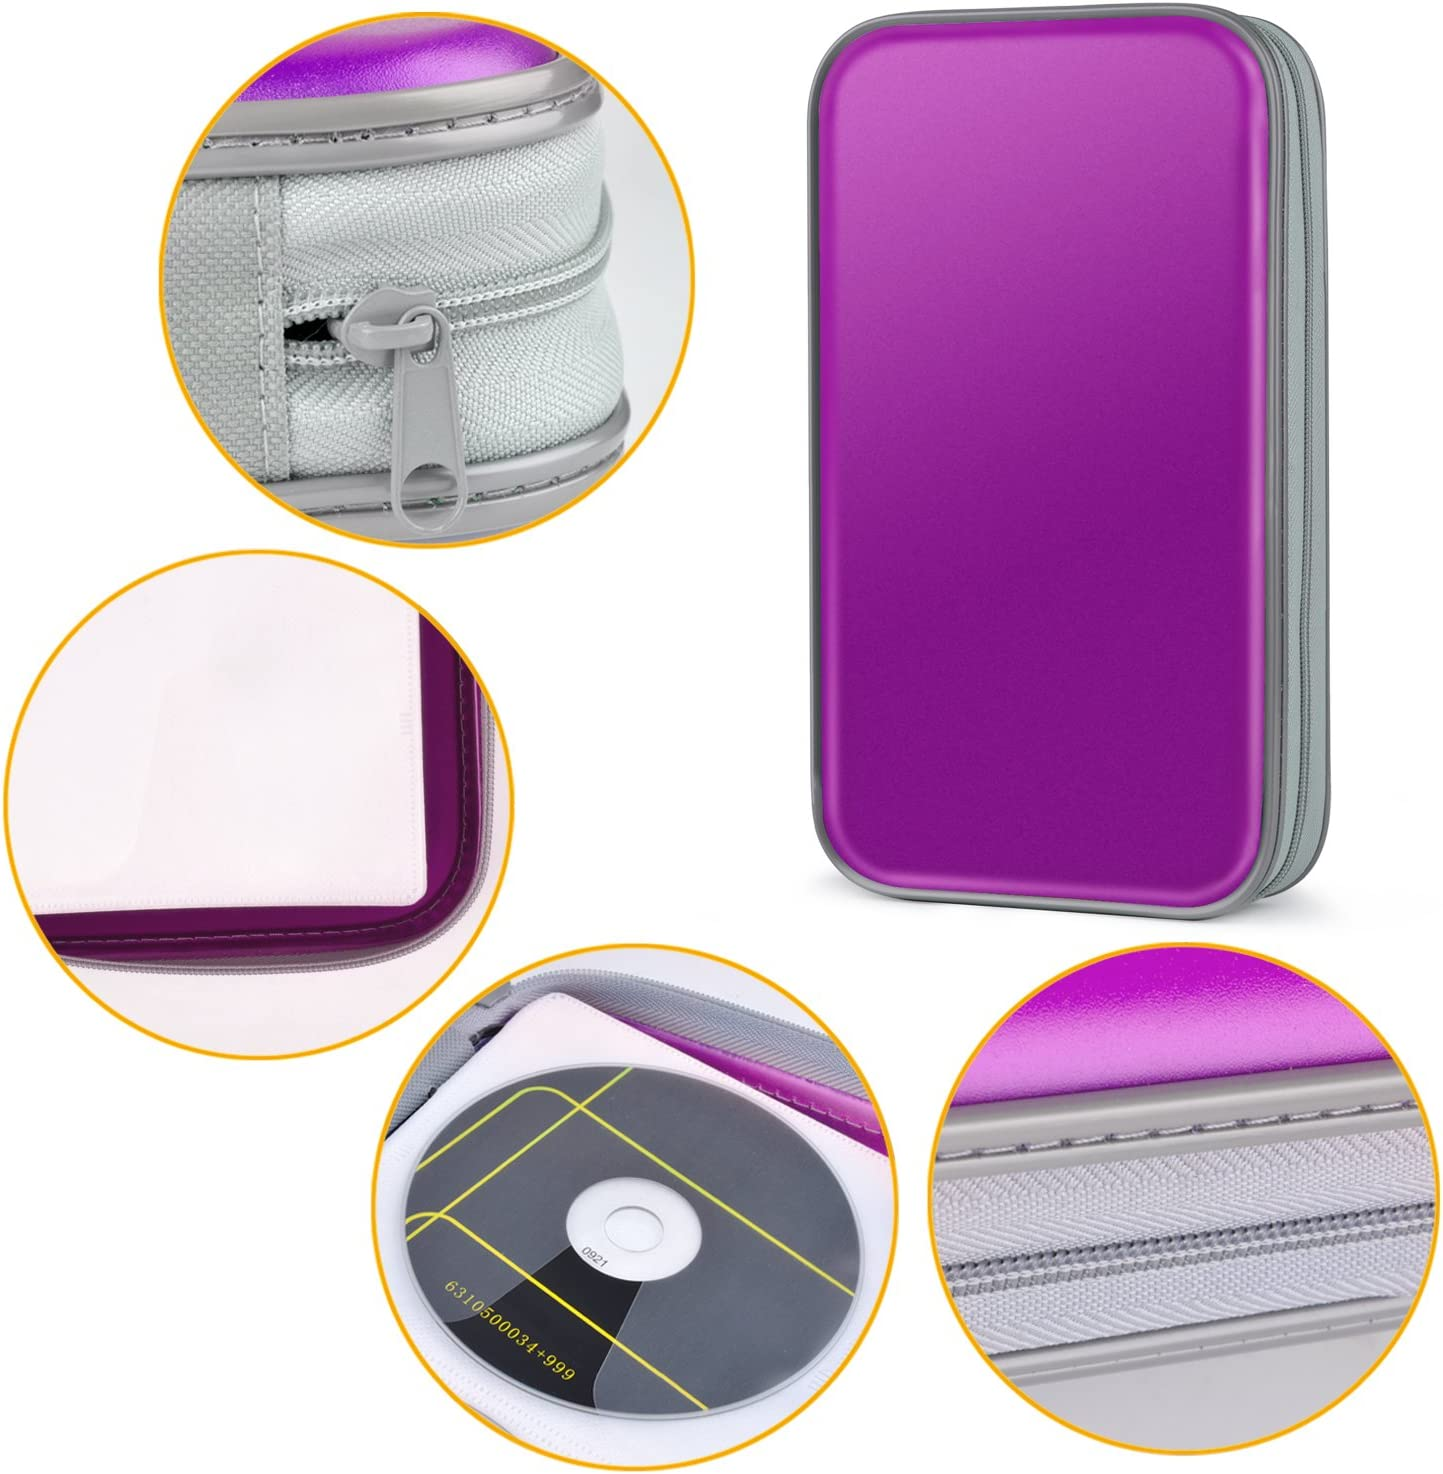 Tinksky Porta CD para 80 CDs//DVDs Almacenamiento de CD para CD//DVD Protectora CD Estuche